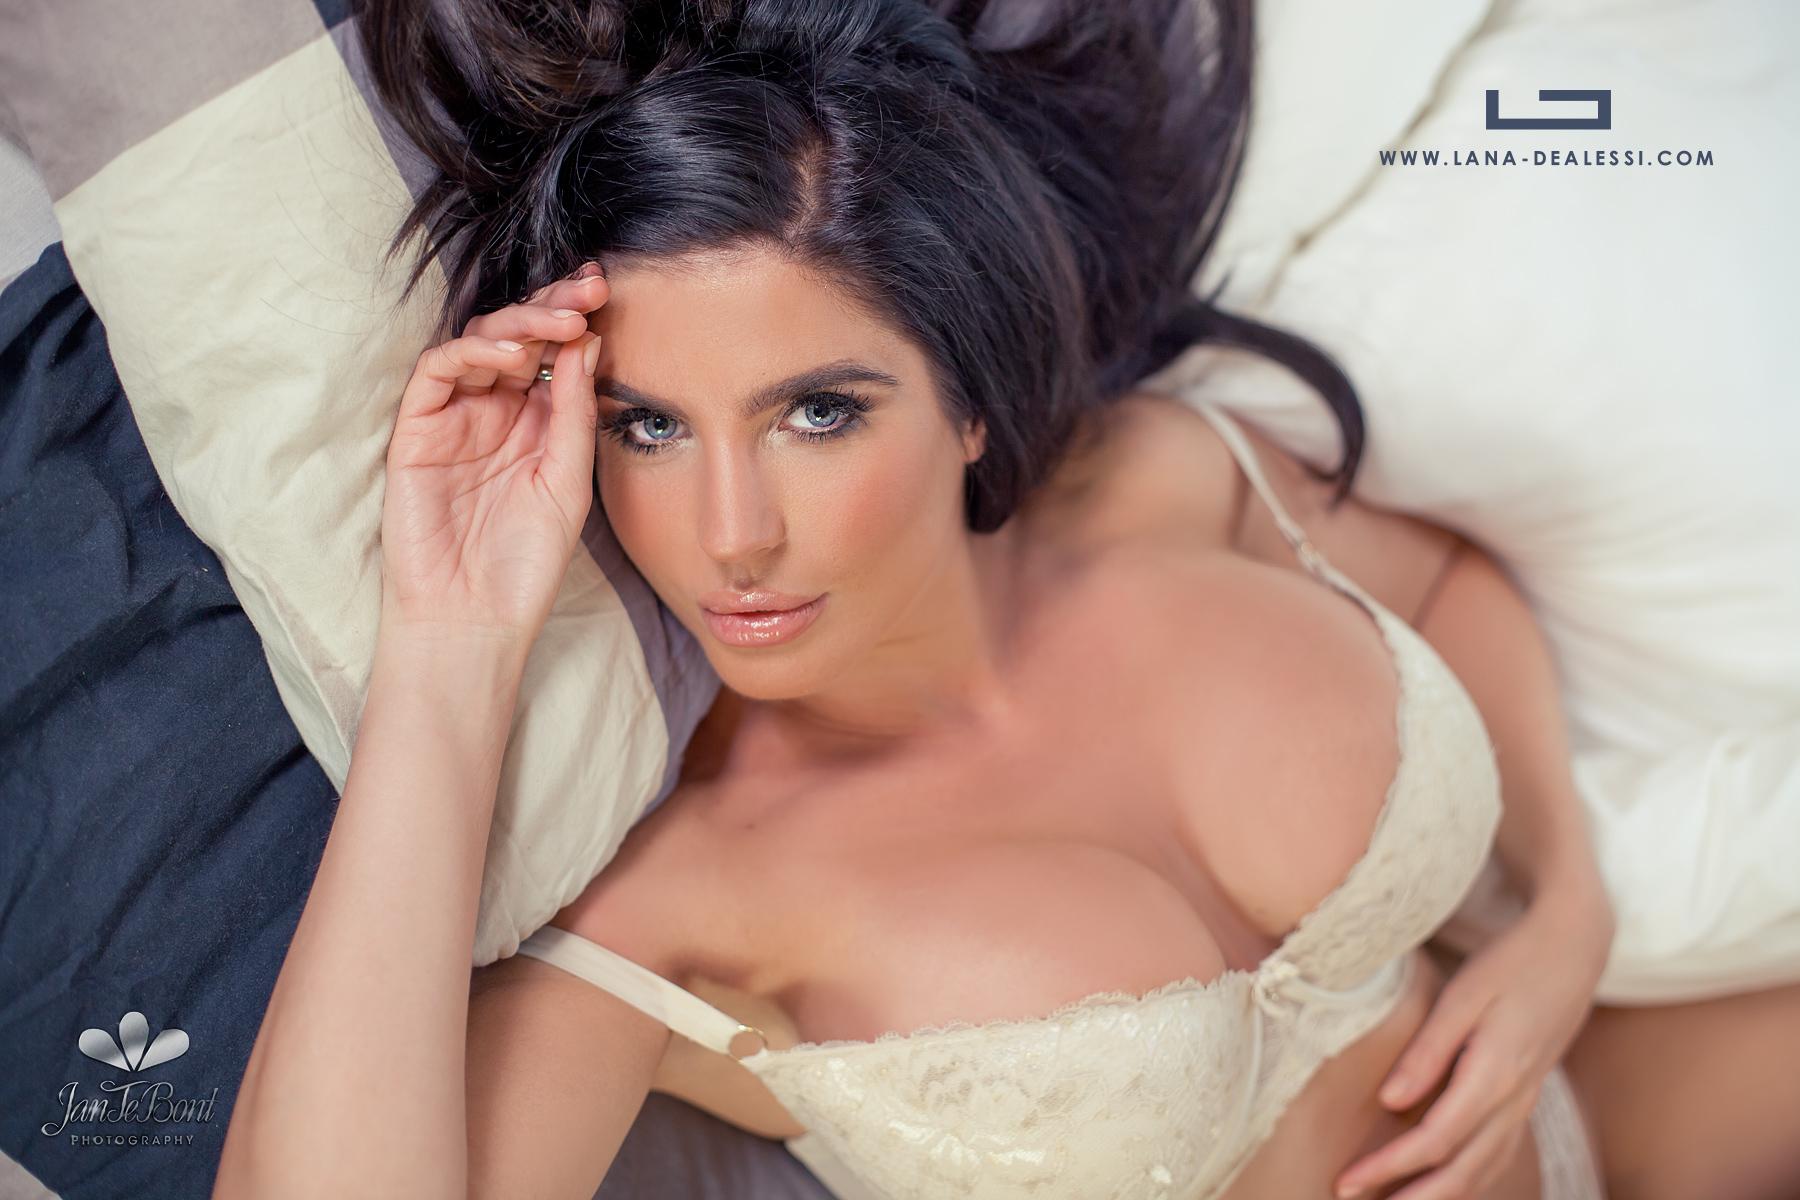 Lana Dealessi brunette lips longhair model glamour busty big boobs beauty sexy perfect girl lady woman jan te bont jantebont JTB doutze